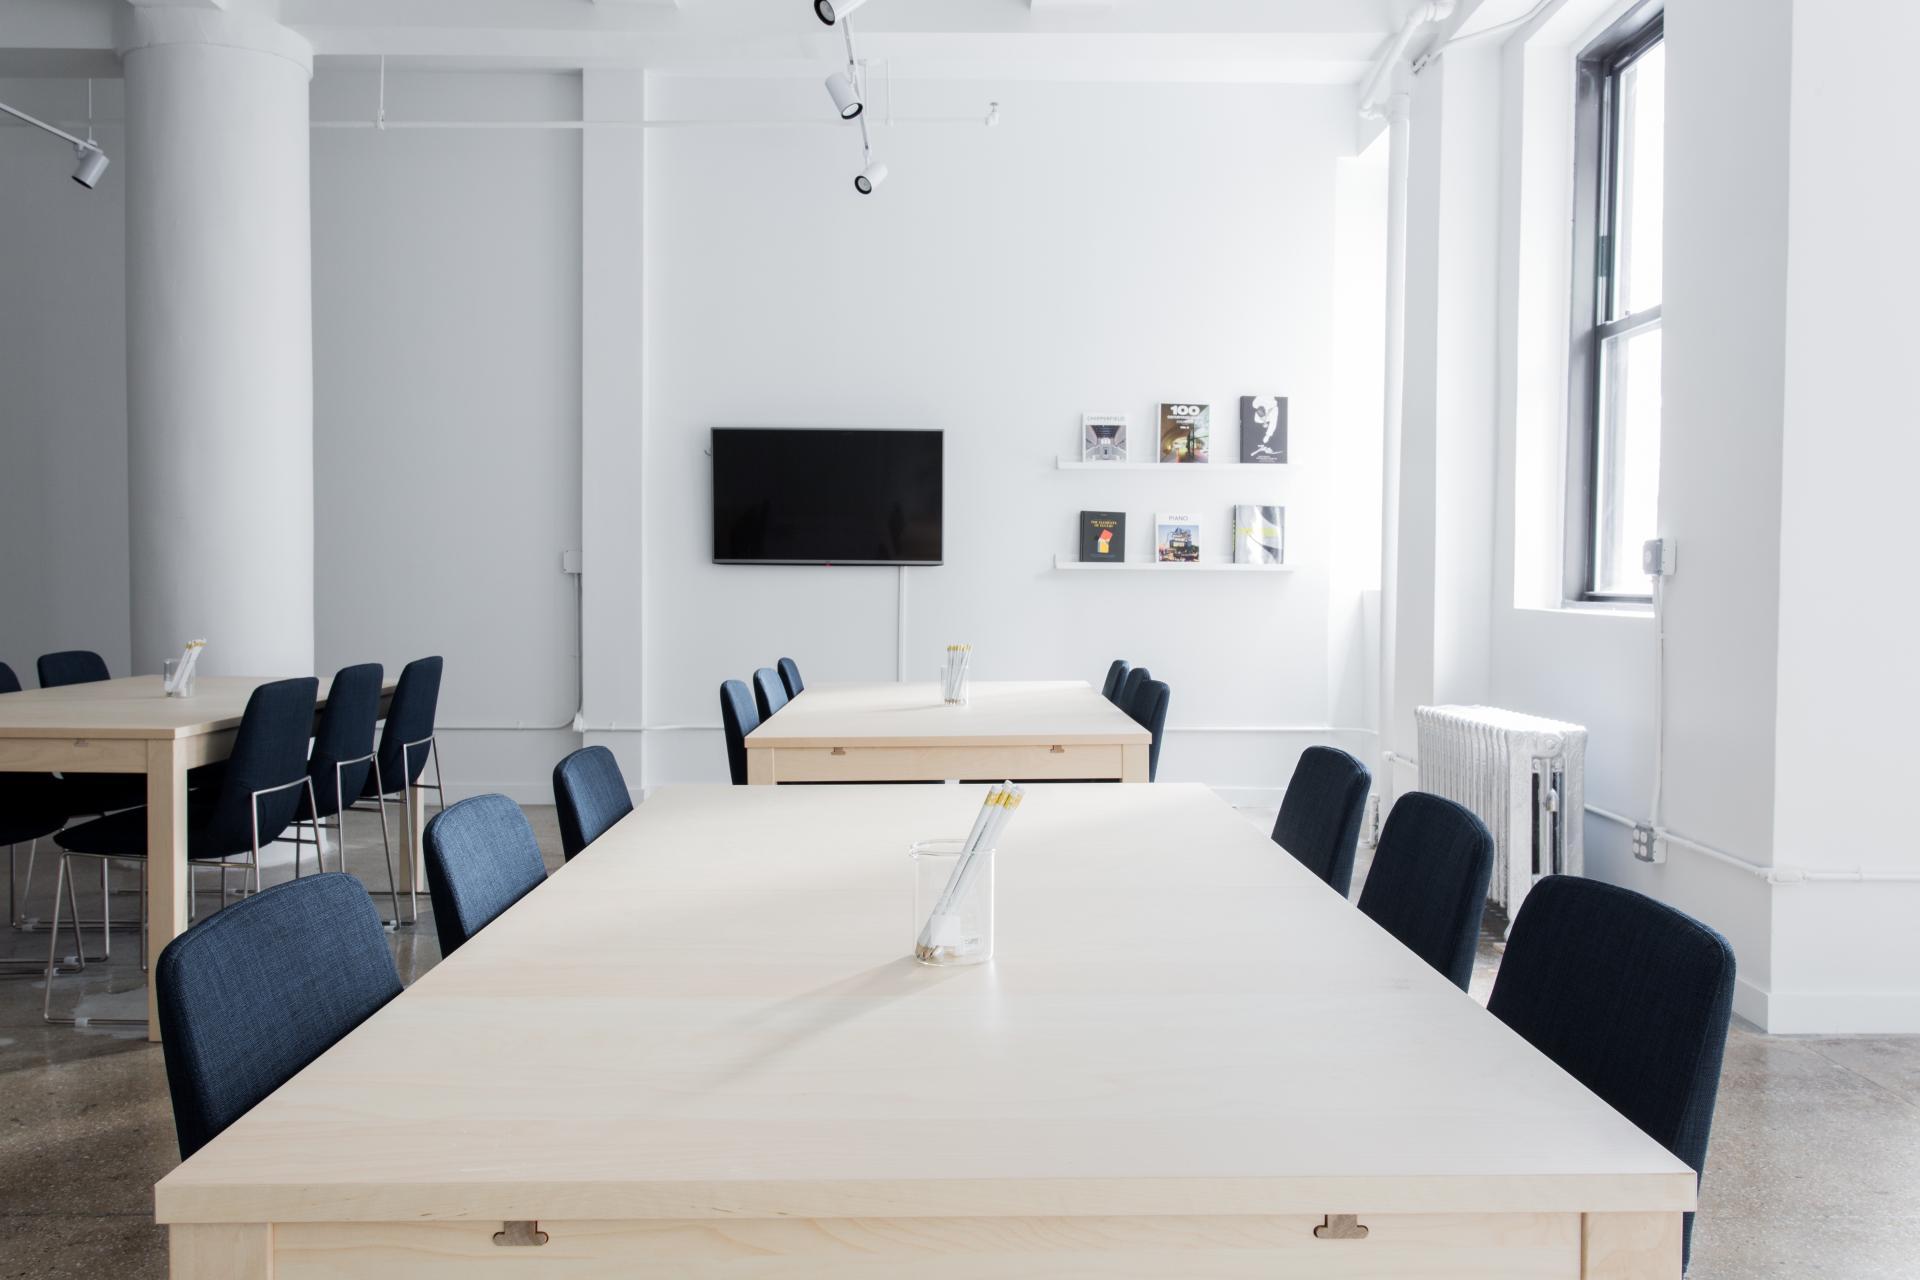 7 Instagram accounts for interior design enthusiasts